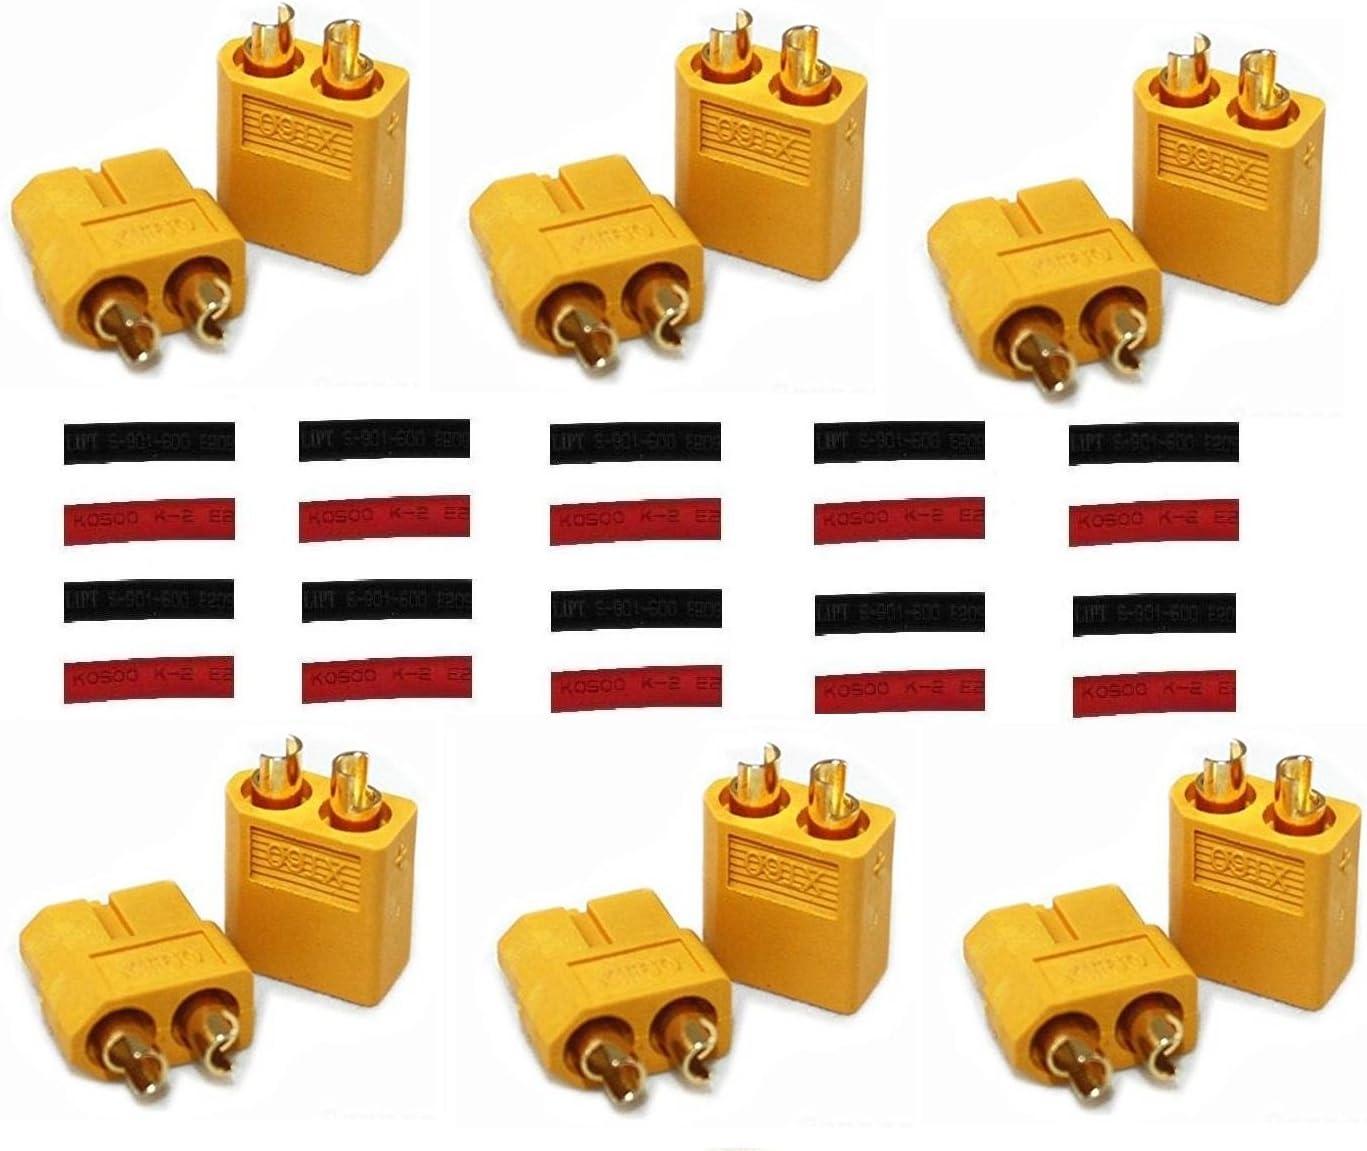 XT60 Connector Set w// Heat Shrink Tubing